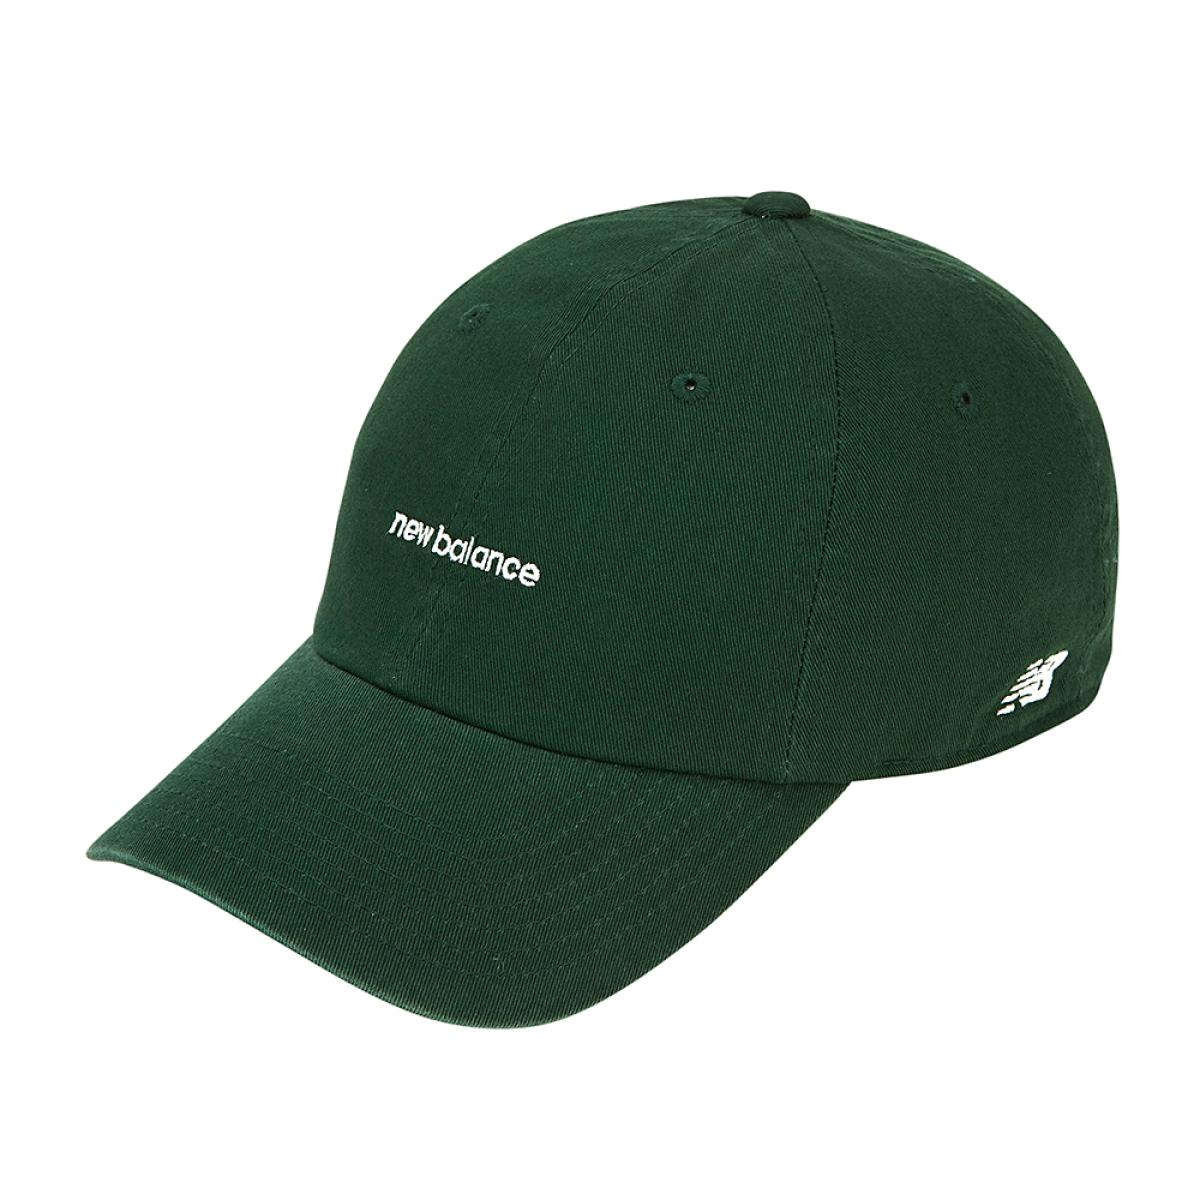 (40)Green